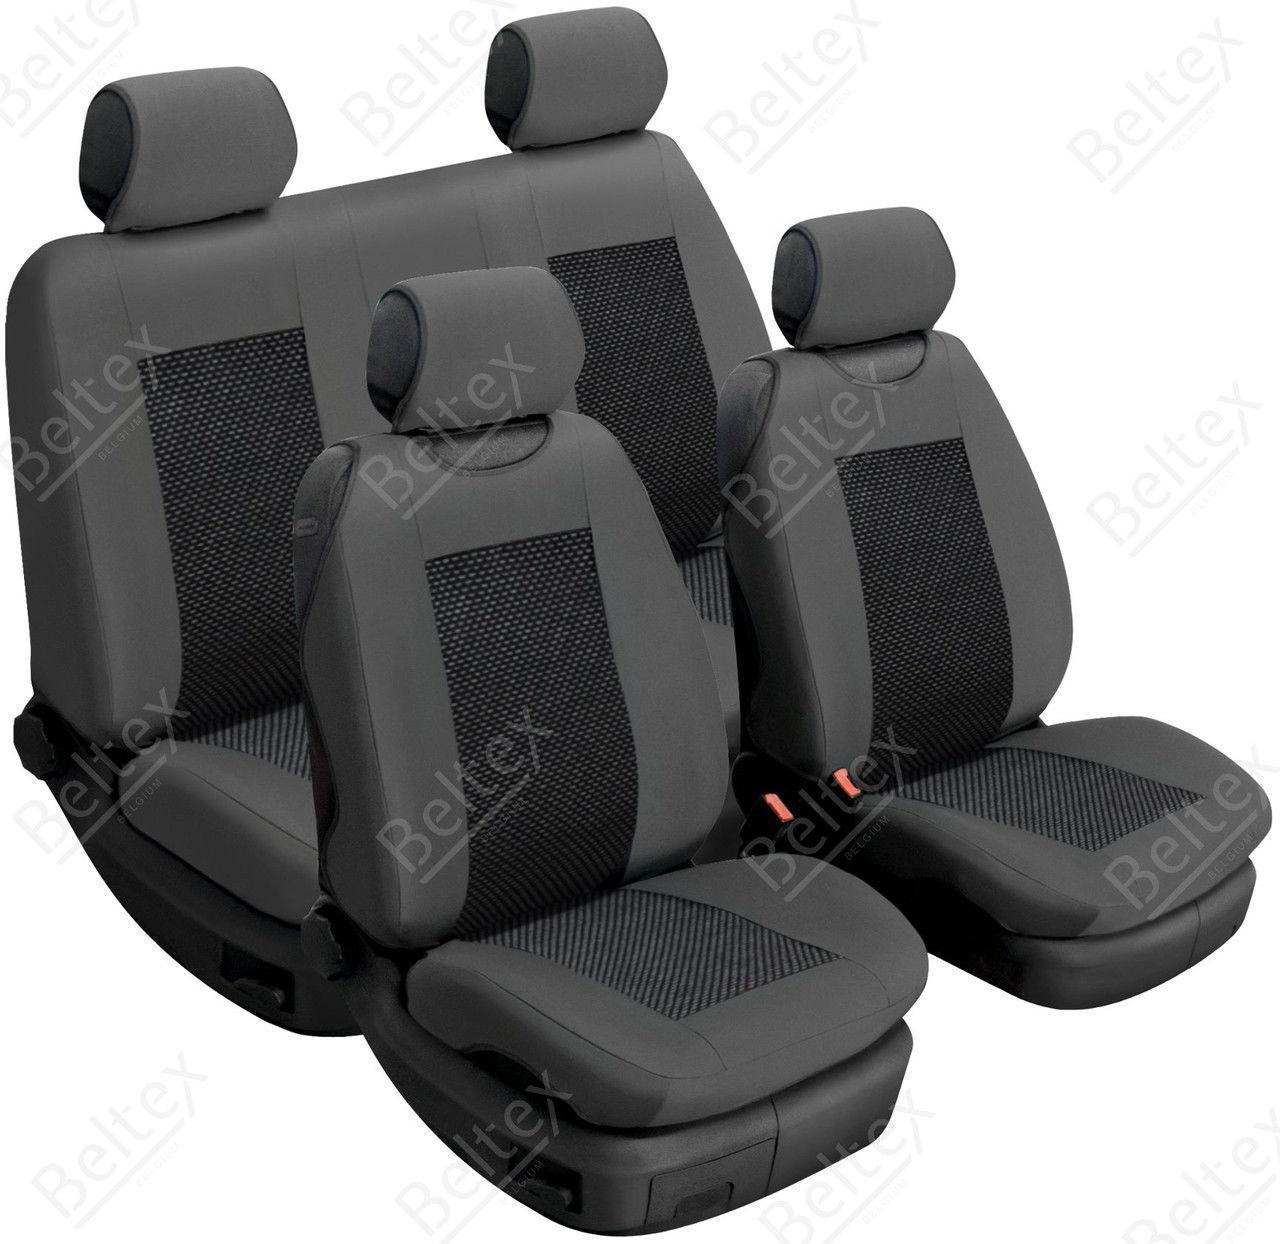 Майки/чехлы на сиденья Ауди А4 Б7 (Audi A4 B7)